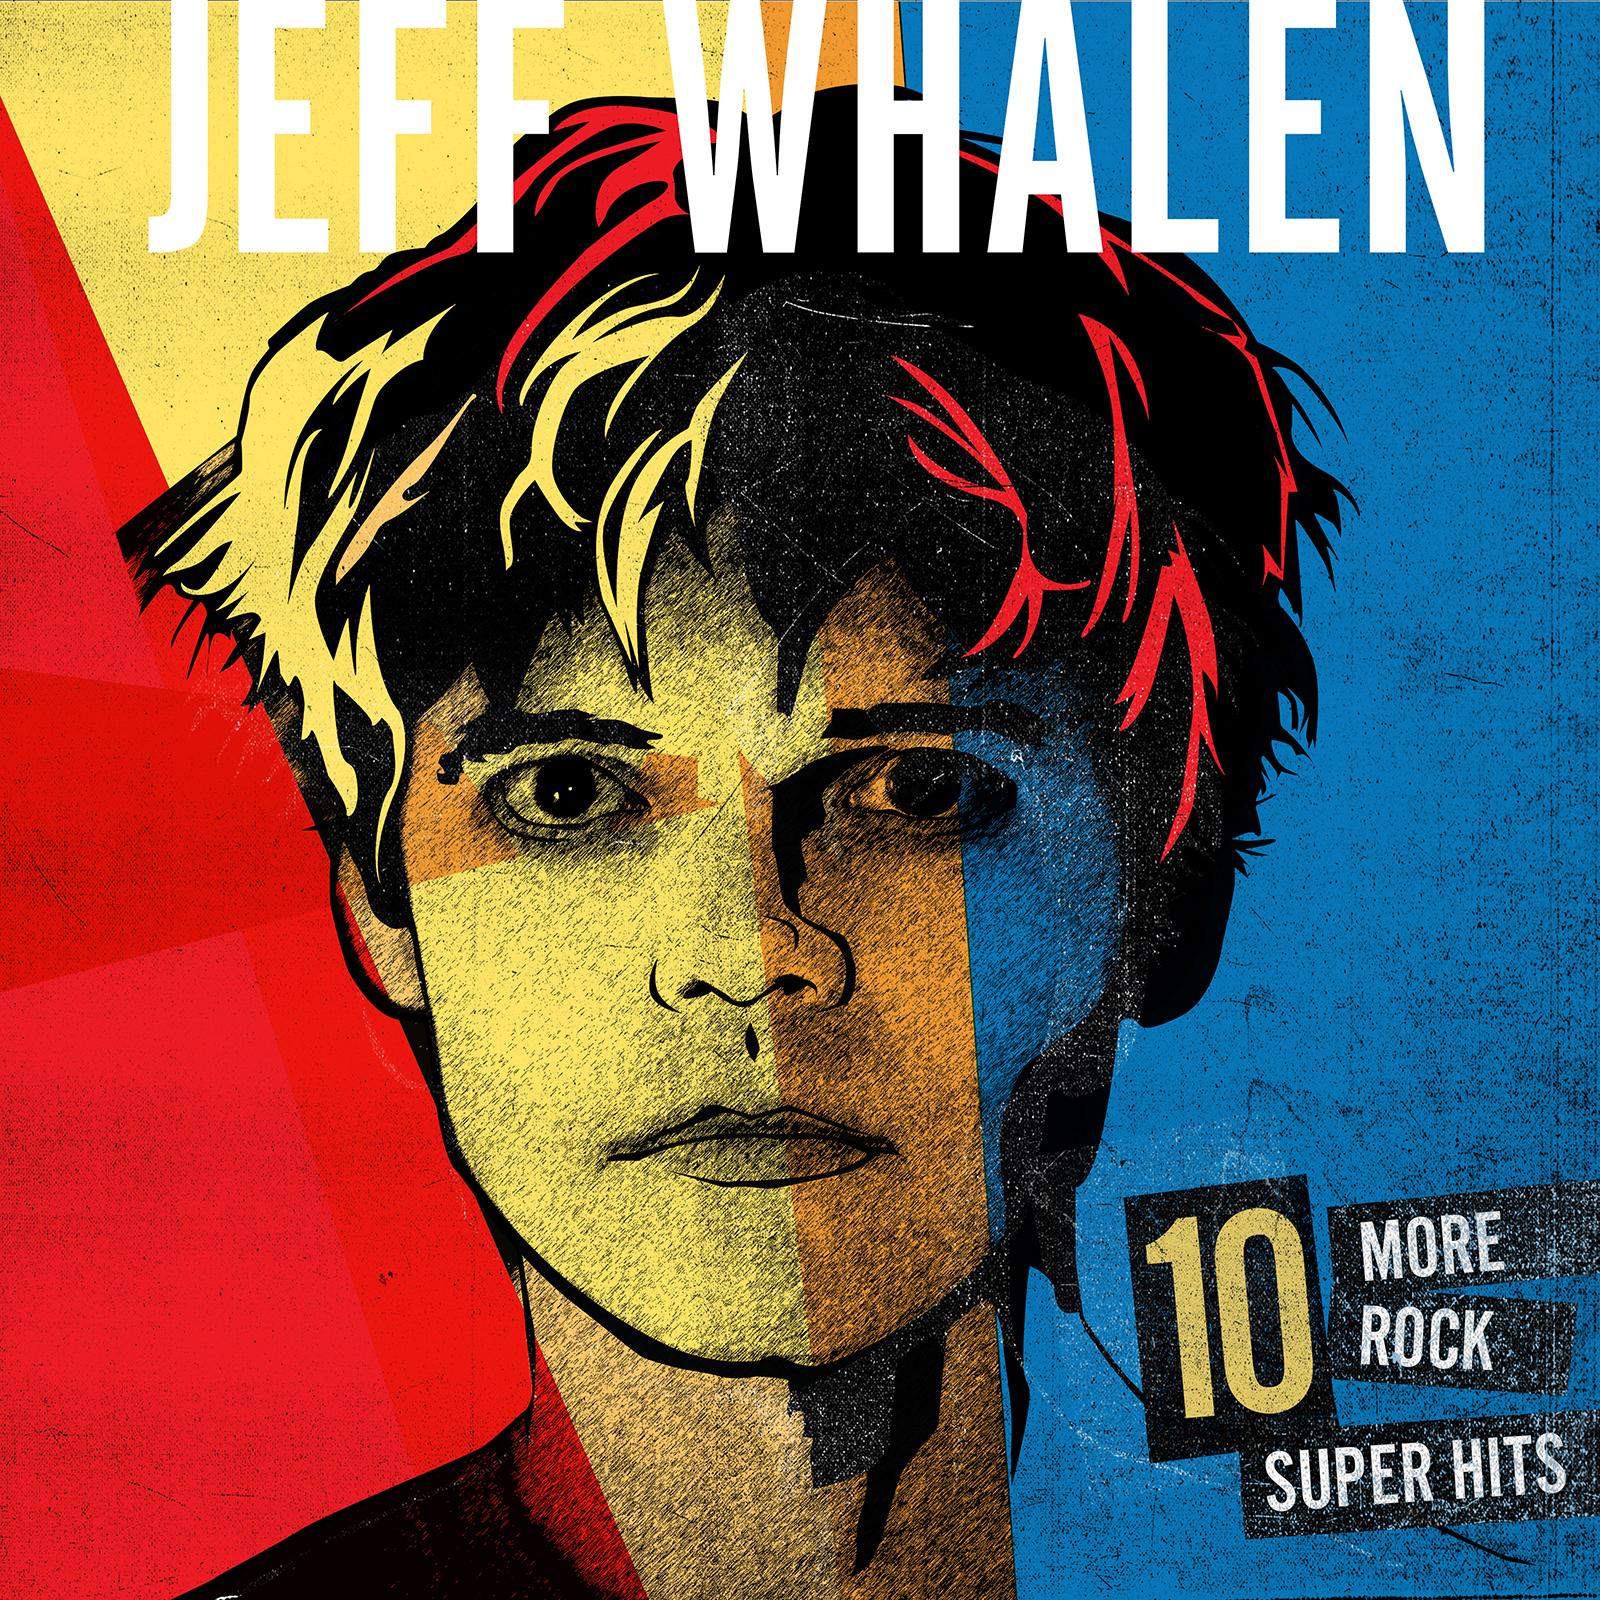 "Jeff Whalen / 10 More Rock Super Hits VINYL - The album Bun E Carlos called ""power pop perfection"" - includes complete album lyrics insert (these lyrics are not found in the Jeff Whalen lyric book) $18 + S&H"